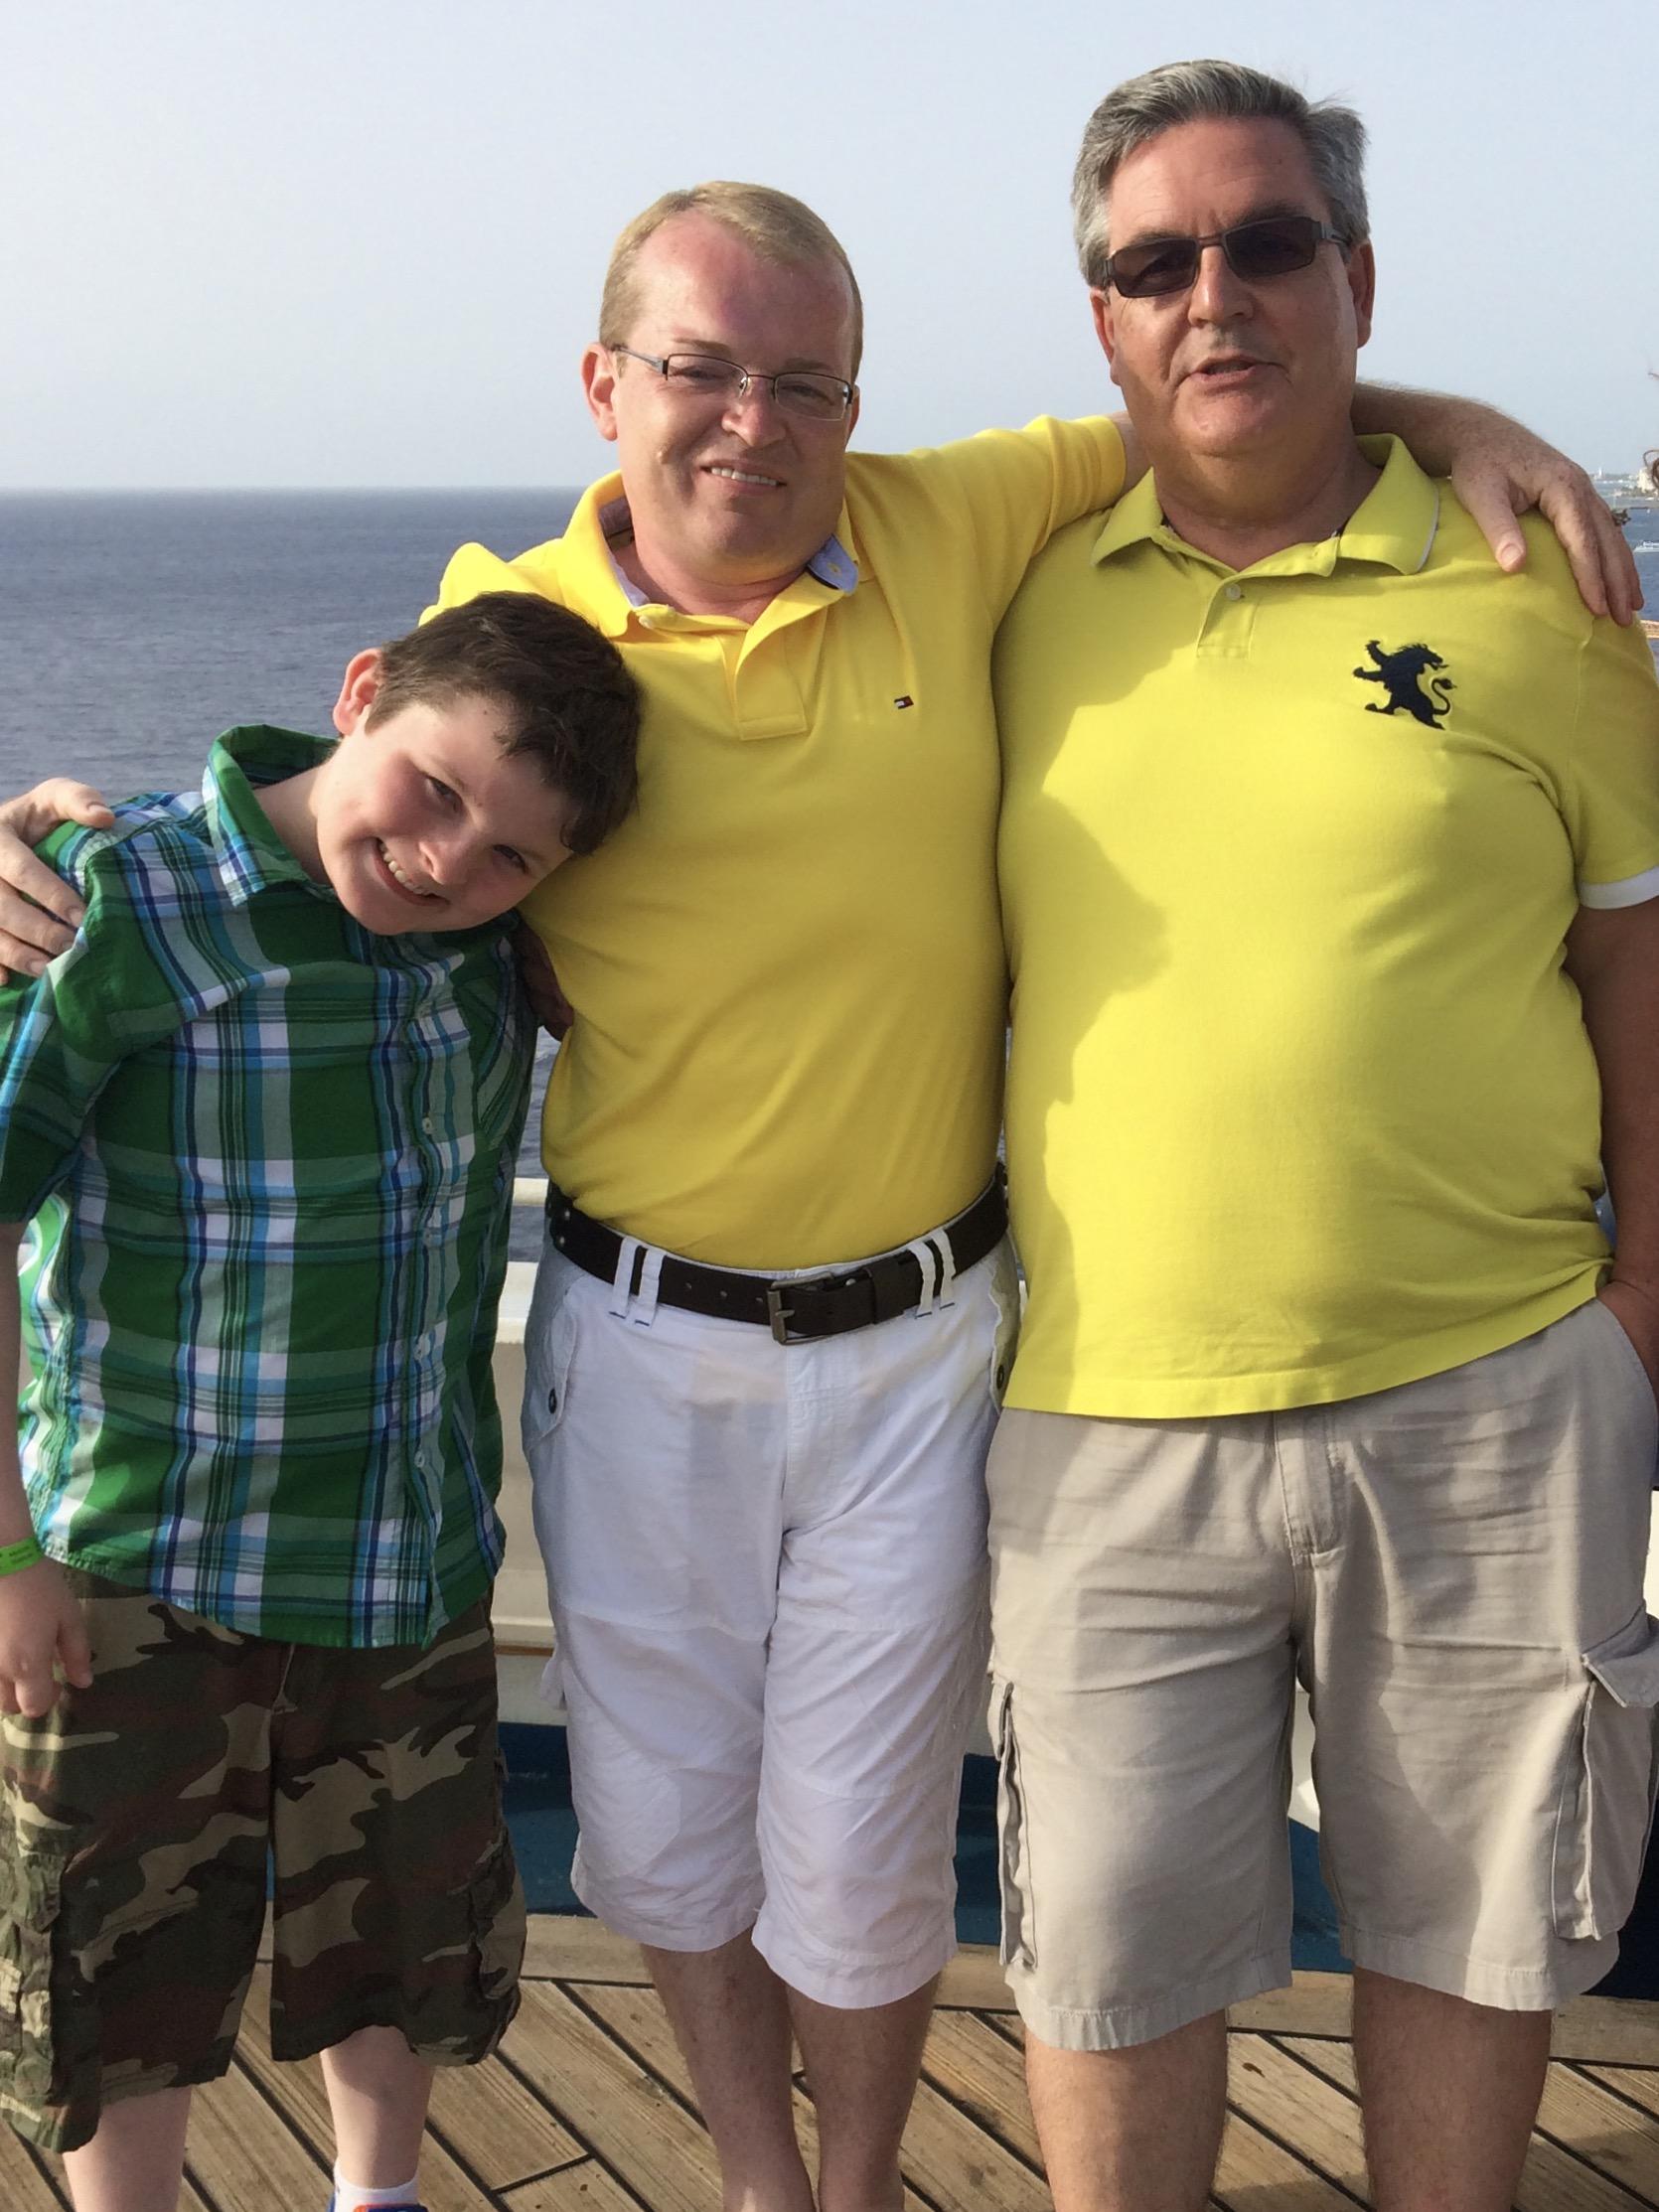 Bryan & Garold, with Connor